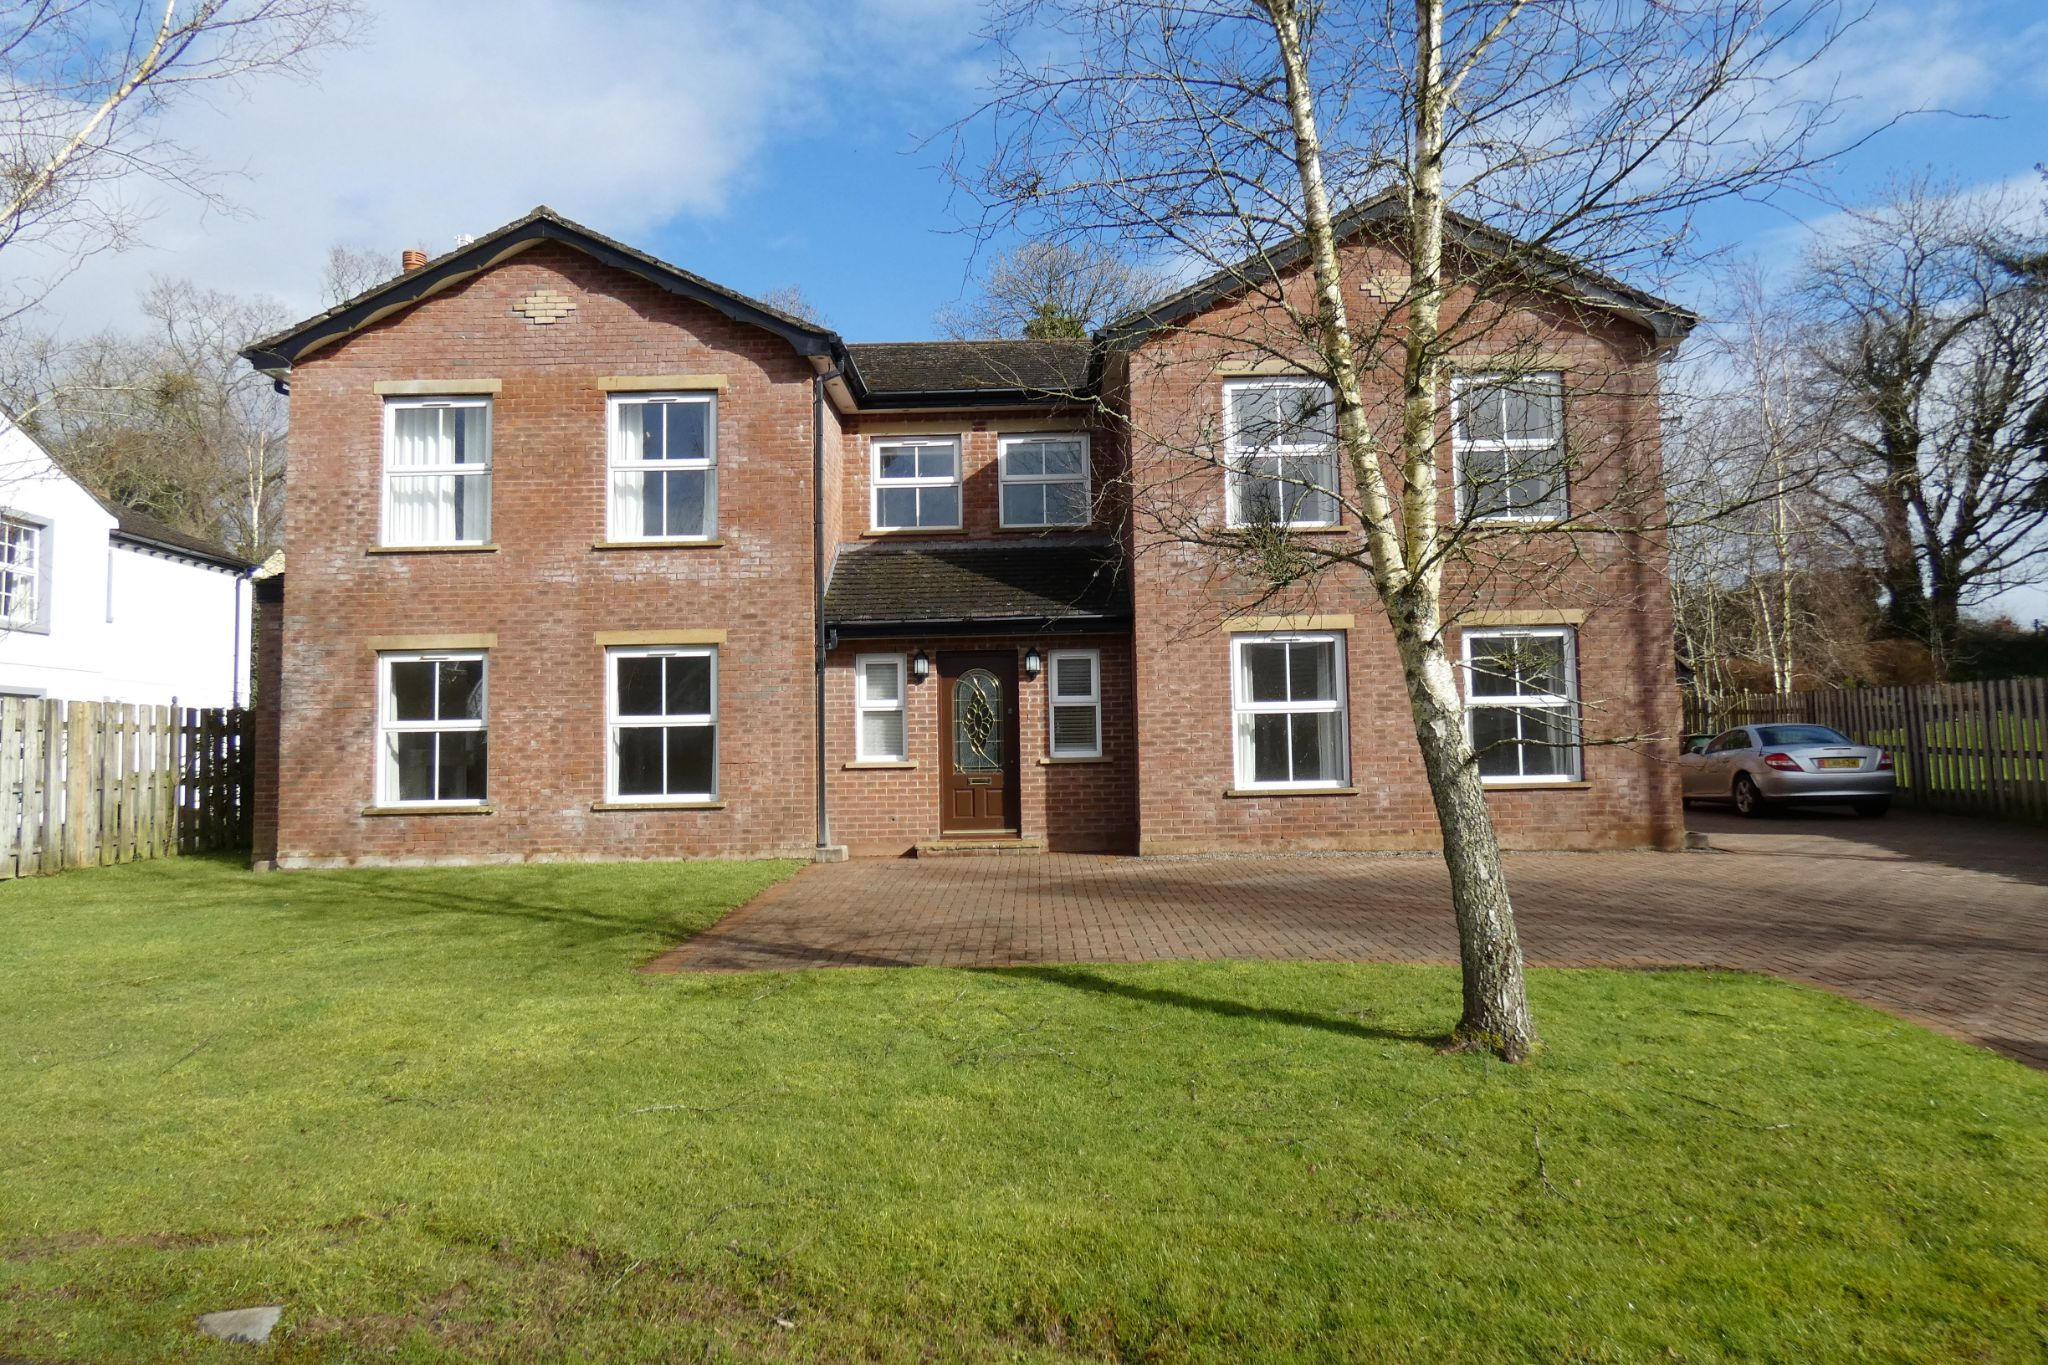 5 bedroom detached house For Sale in Glen Vine - Photograph 1